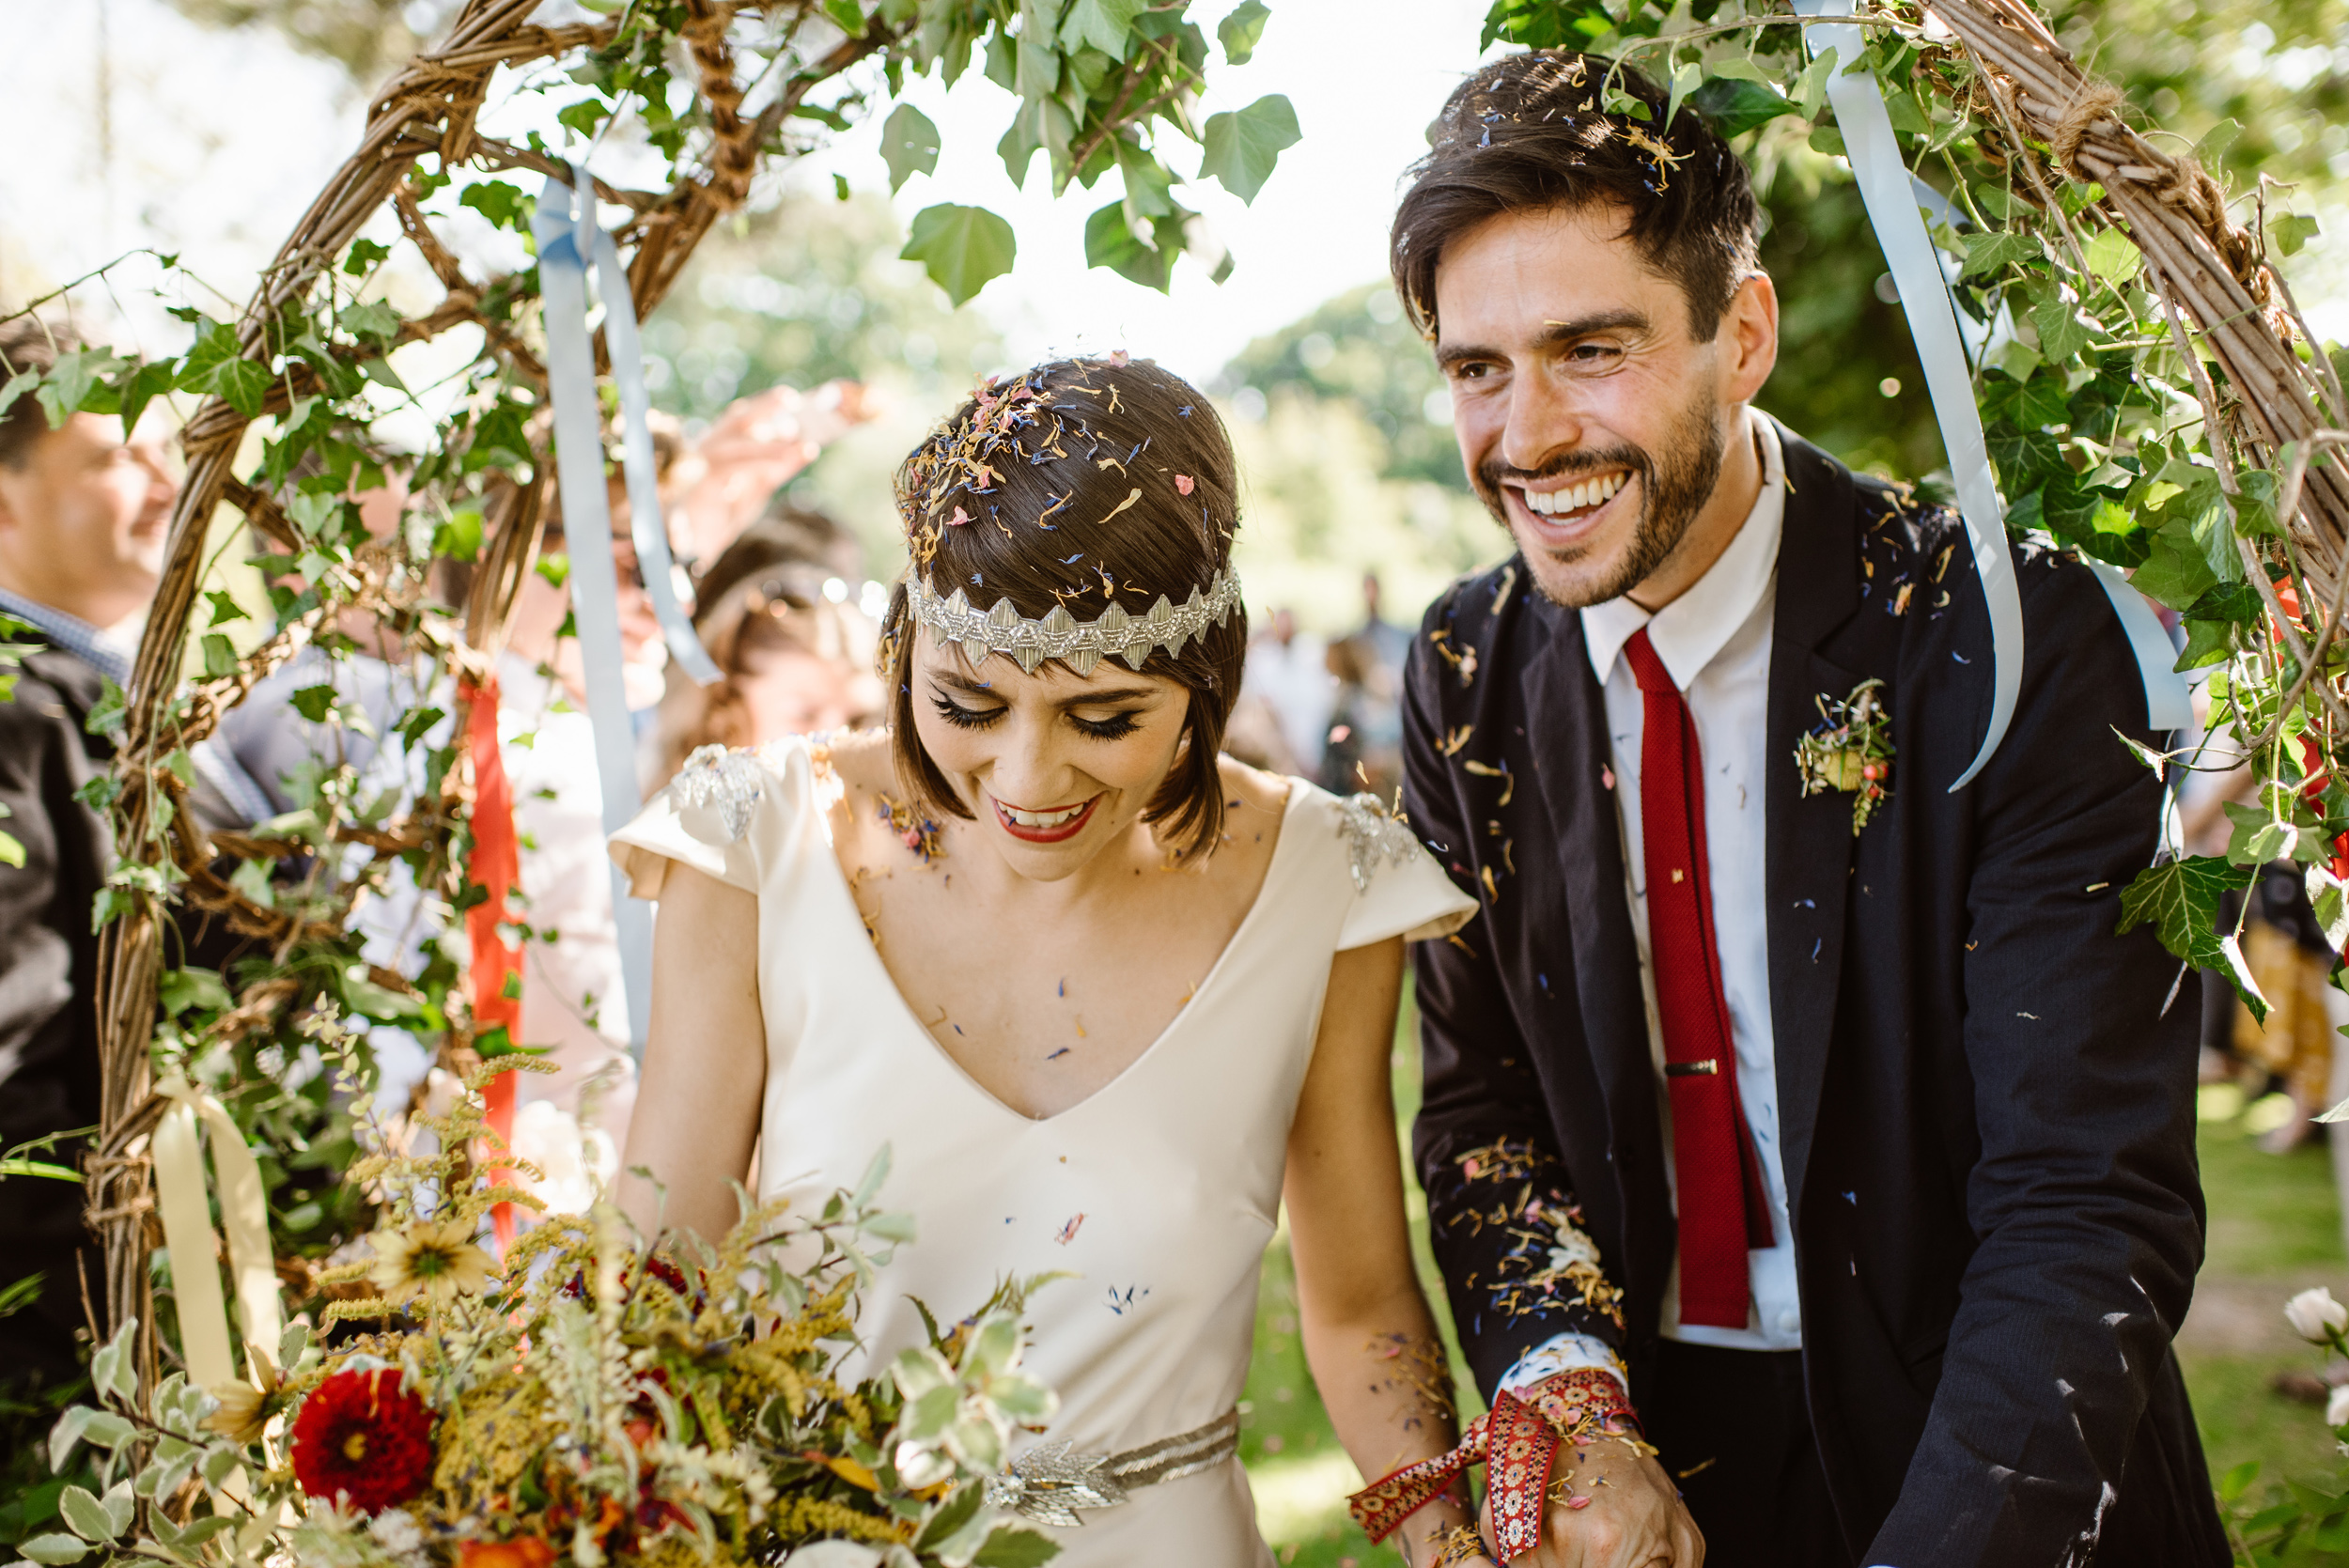 Ro-Kate-Beaumont-bias-cut-silk-wedding-gown-back-garden-wedding-by-Ellie-Gillard-11.jpg